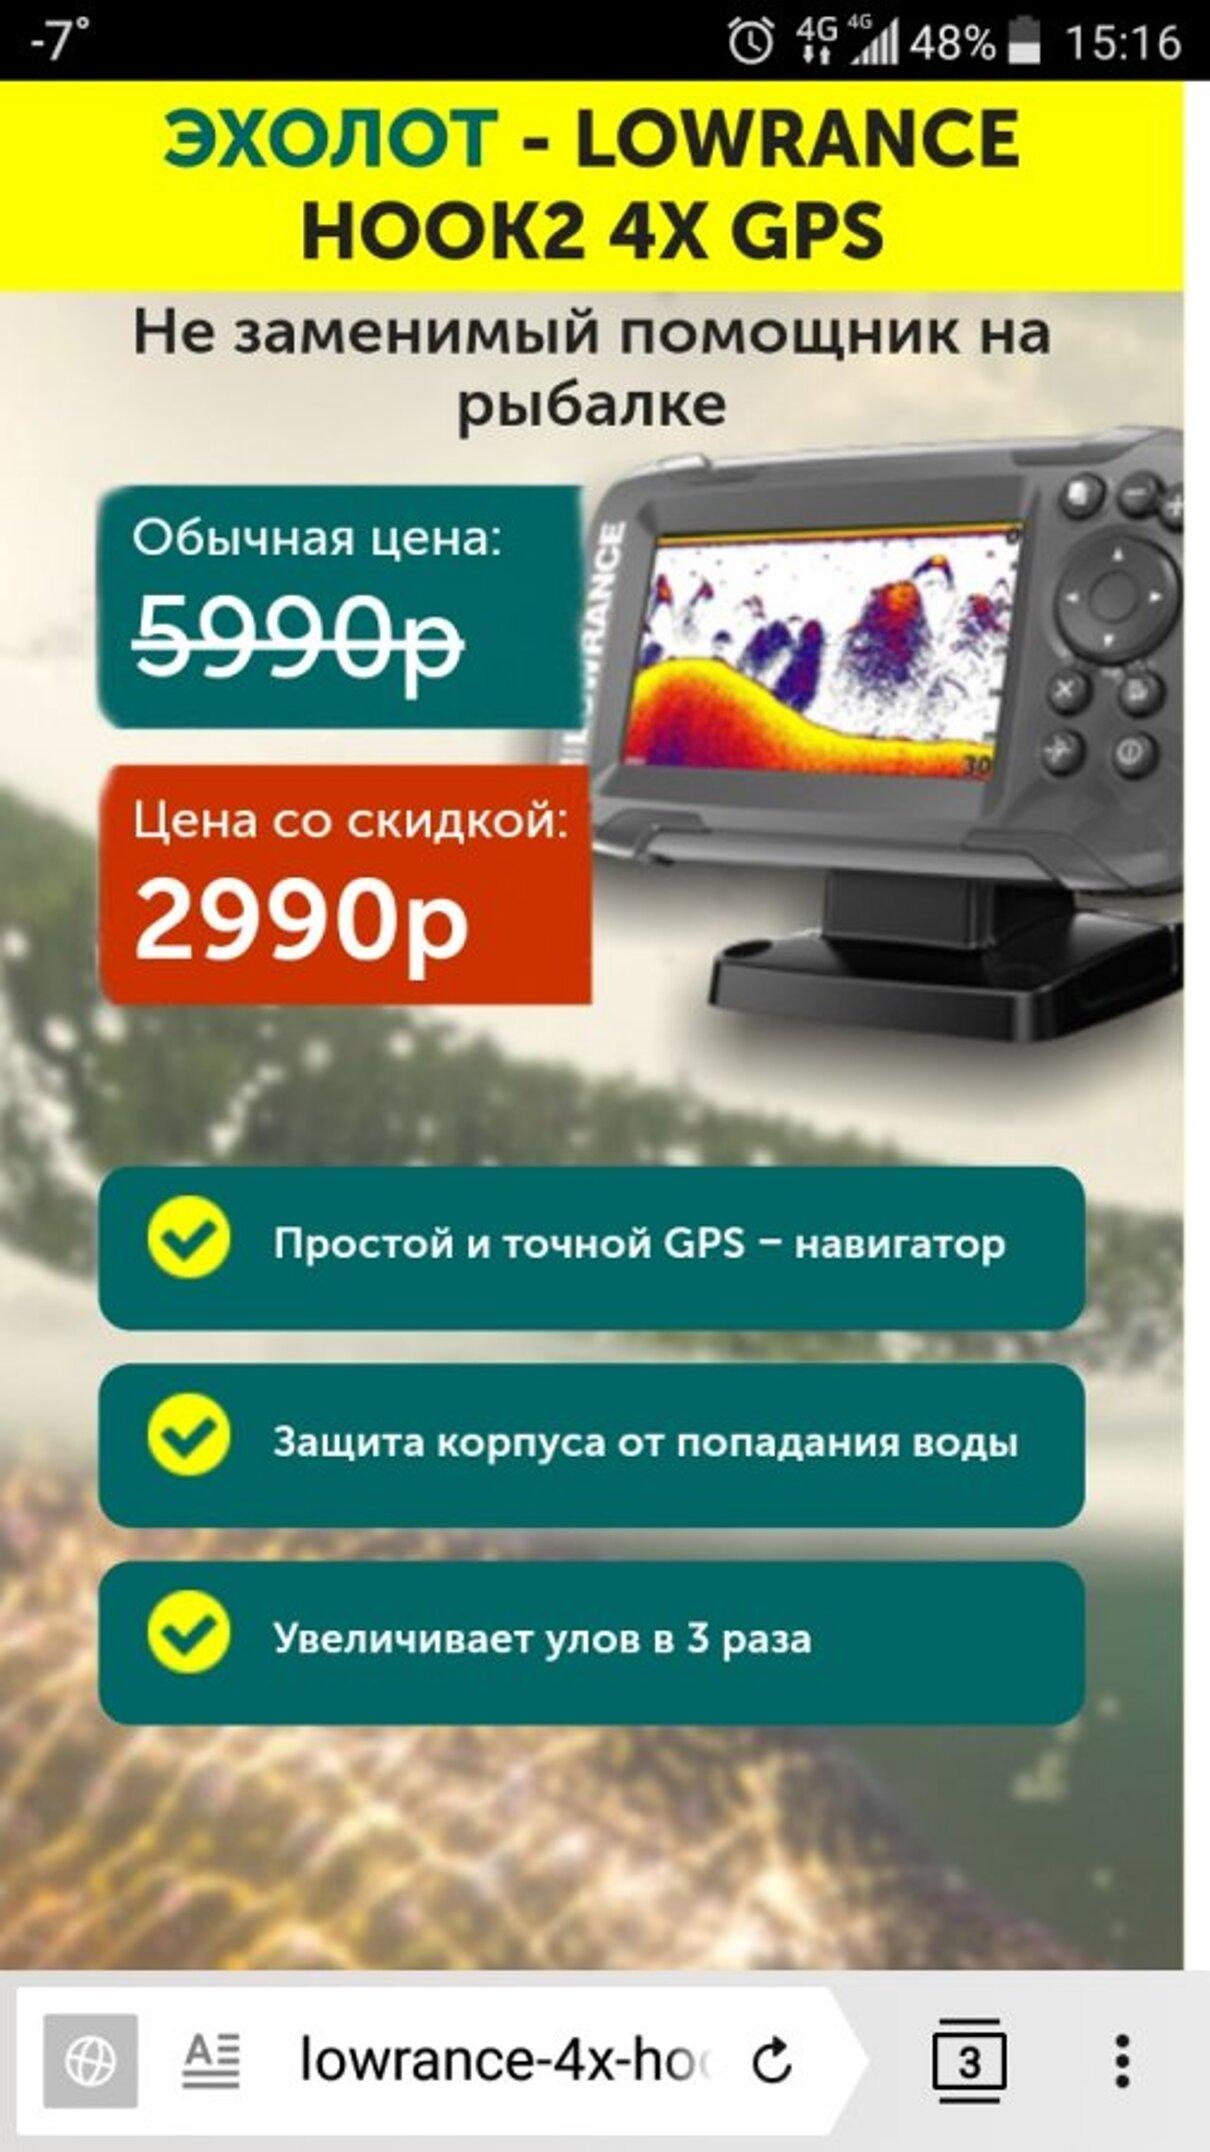 "Жалоба-отзыв: Отдел венера@gmail.ru ООО, Пост сервис"" - Мошенники.  Фото №1"